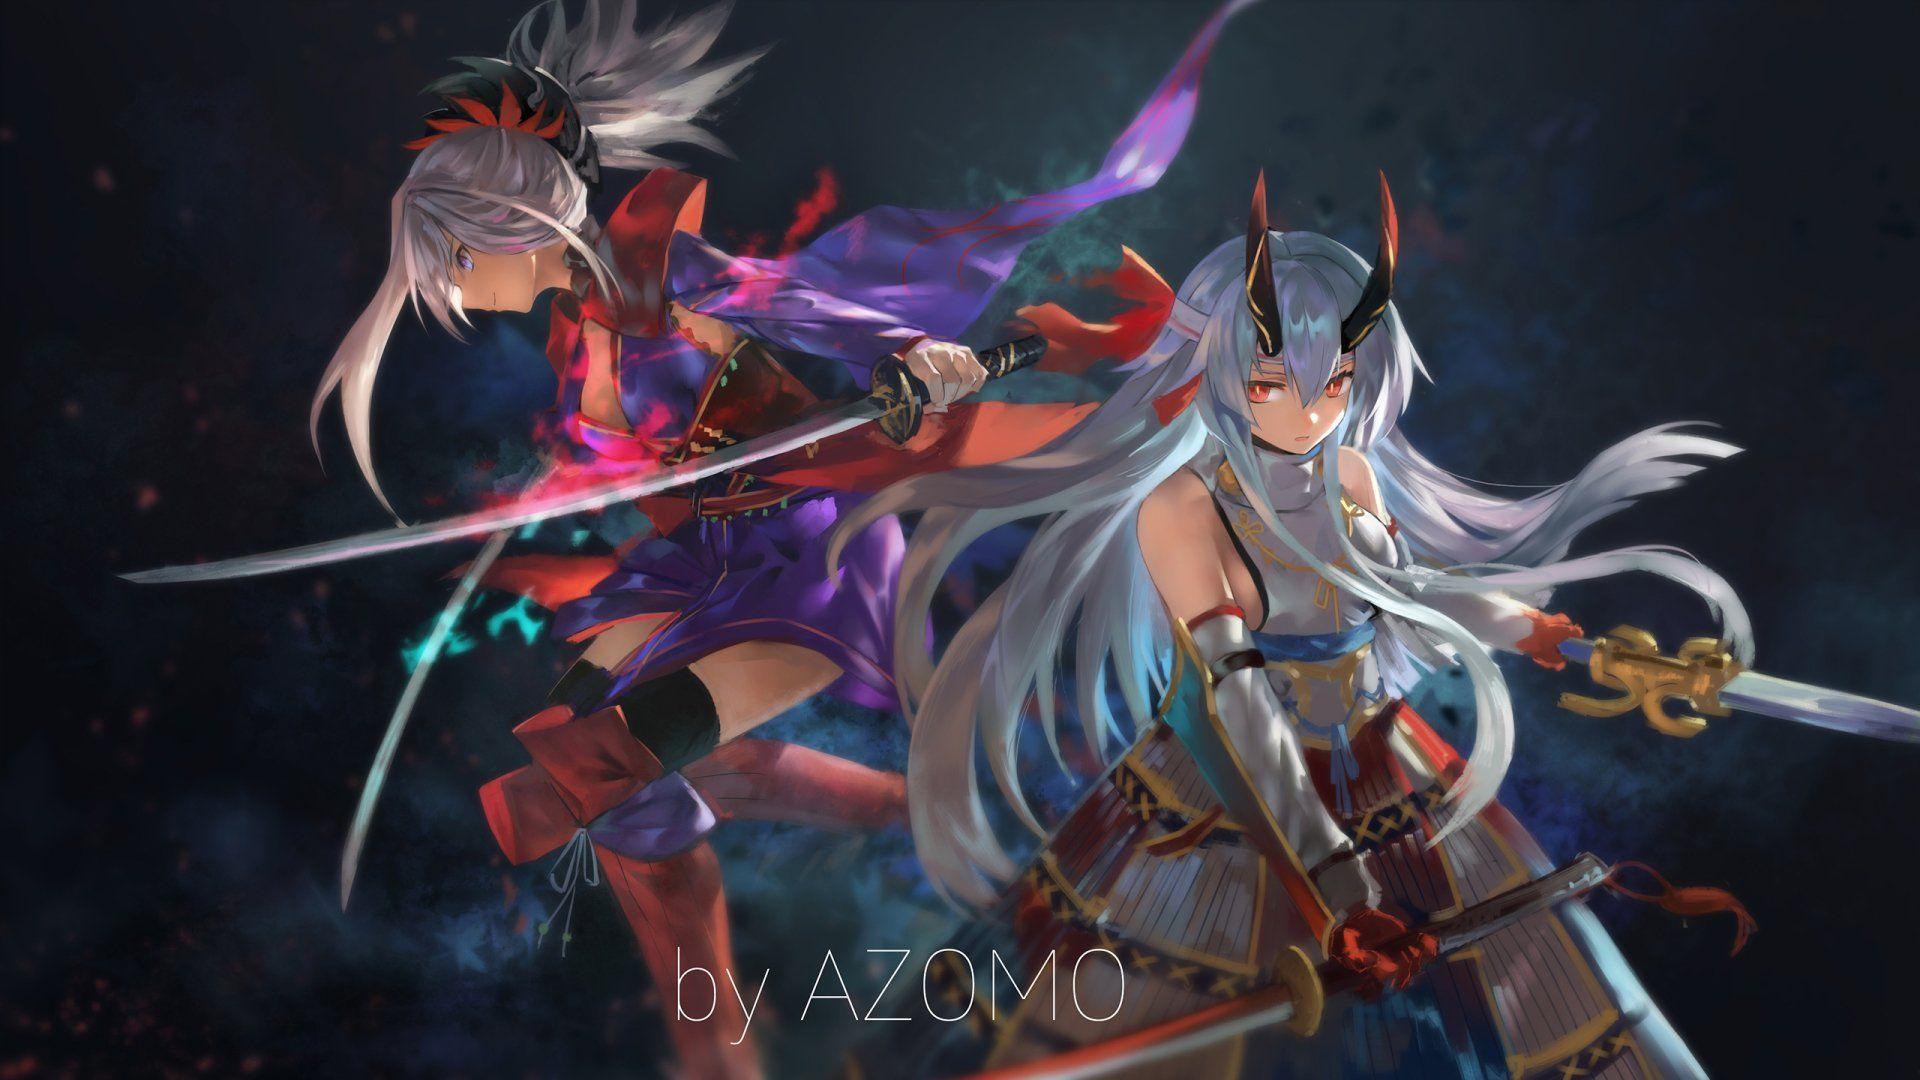 Anime Fate Grand Order Miyamoto Musashi Tomoe Gozen Fate Grand